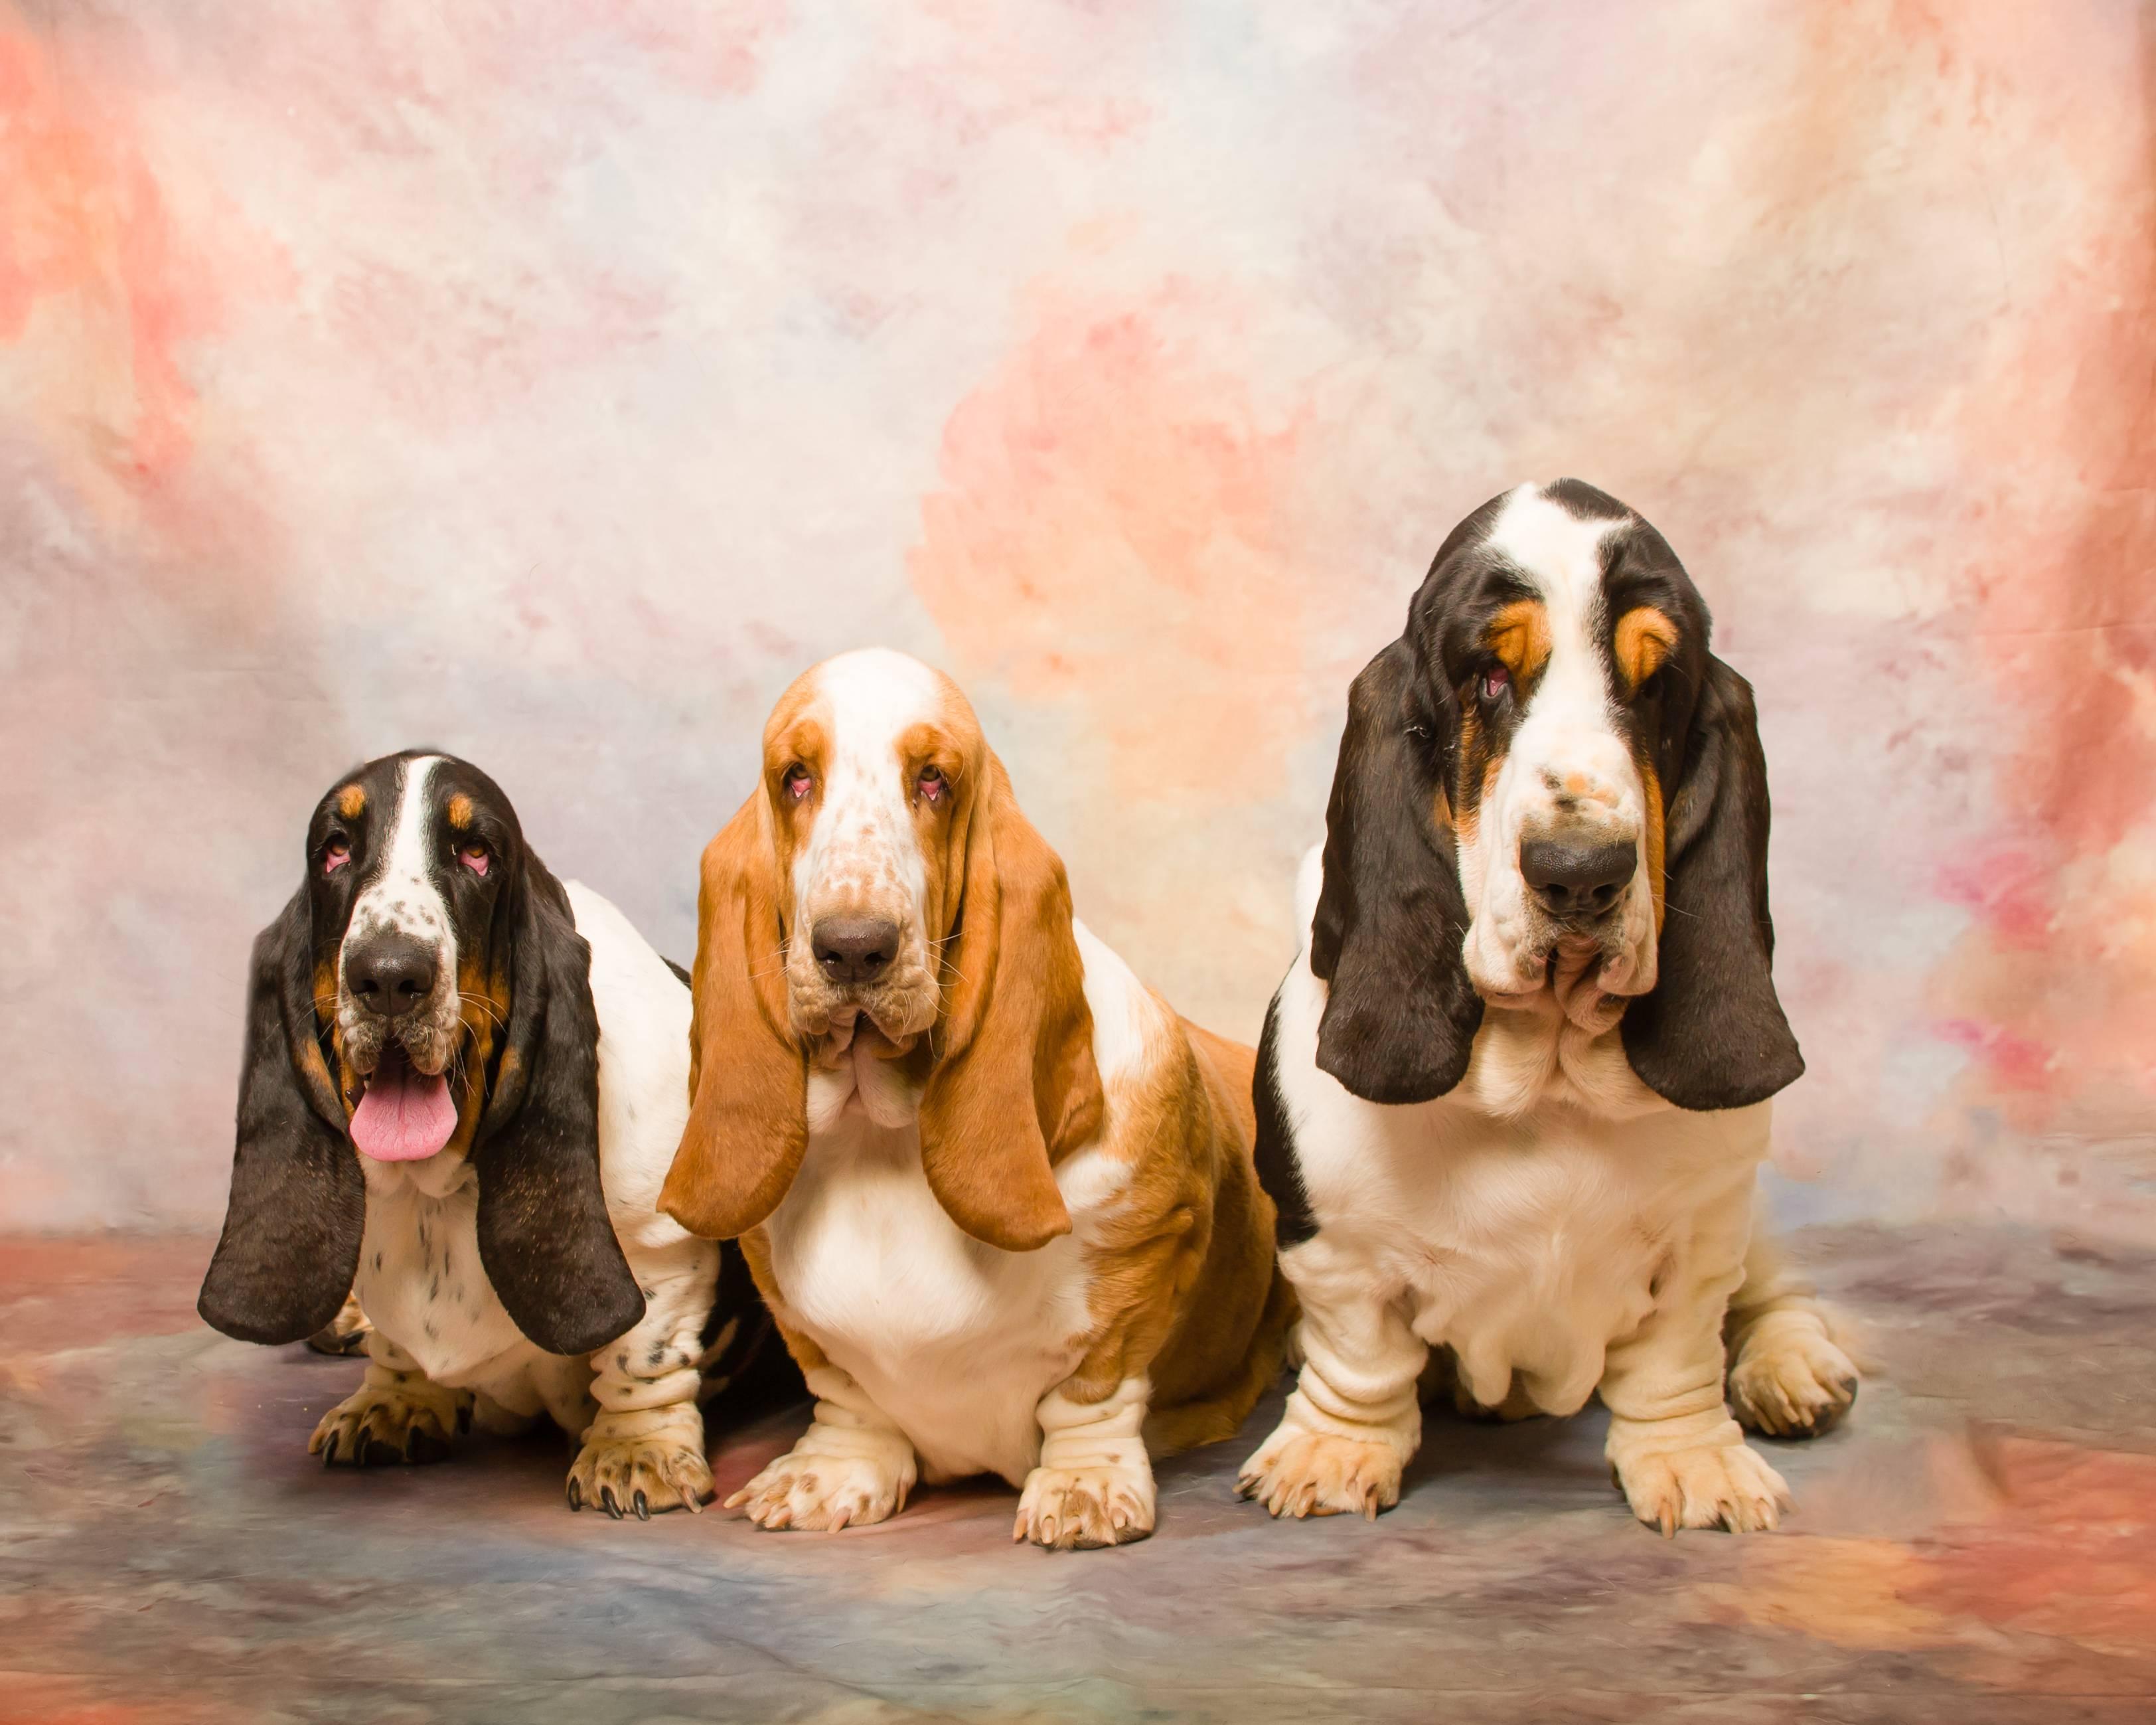 Порода собак бассет-хаунд: фото, описание характер